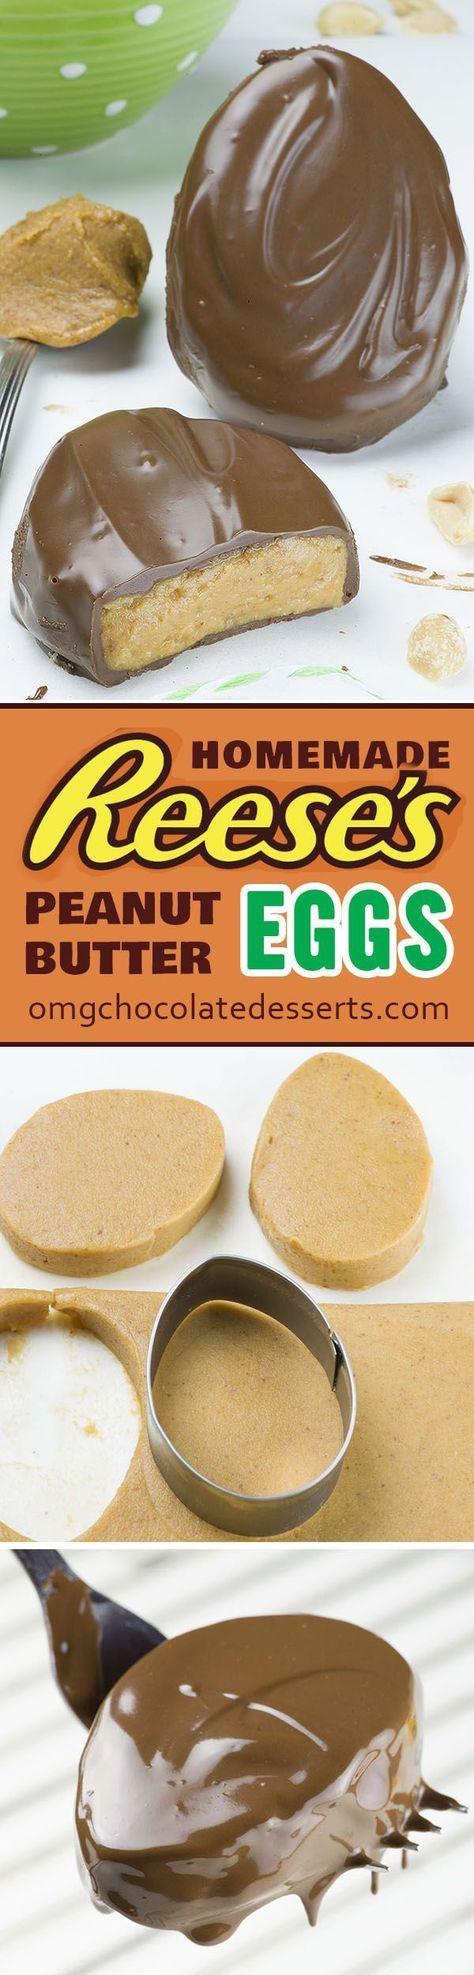 Homemade Chocolate Peanut Butter Egg